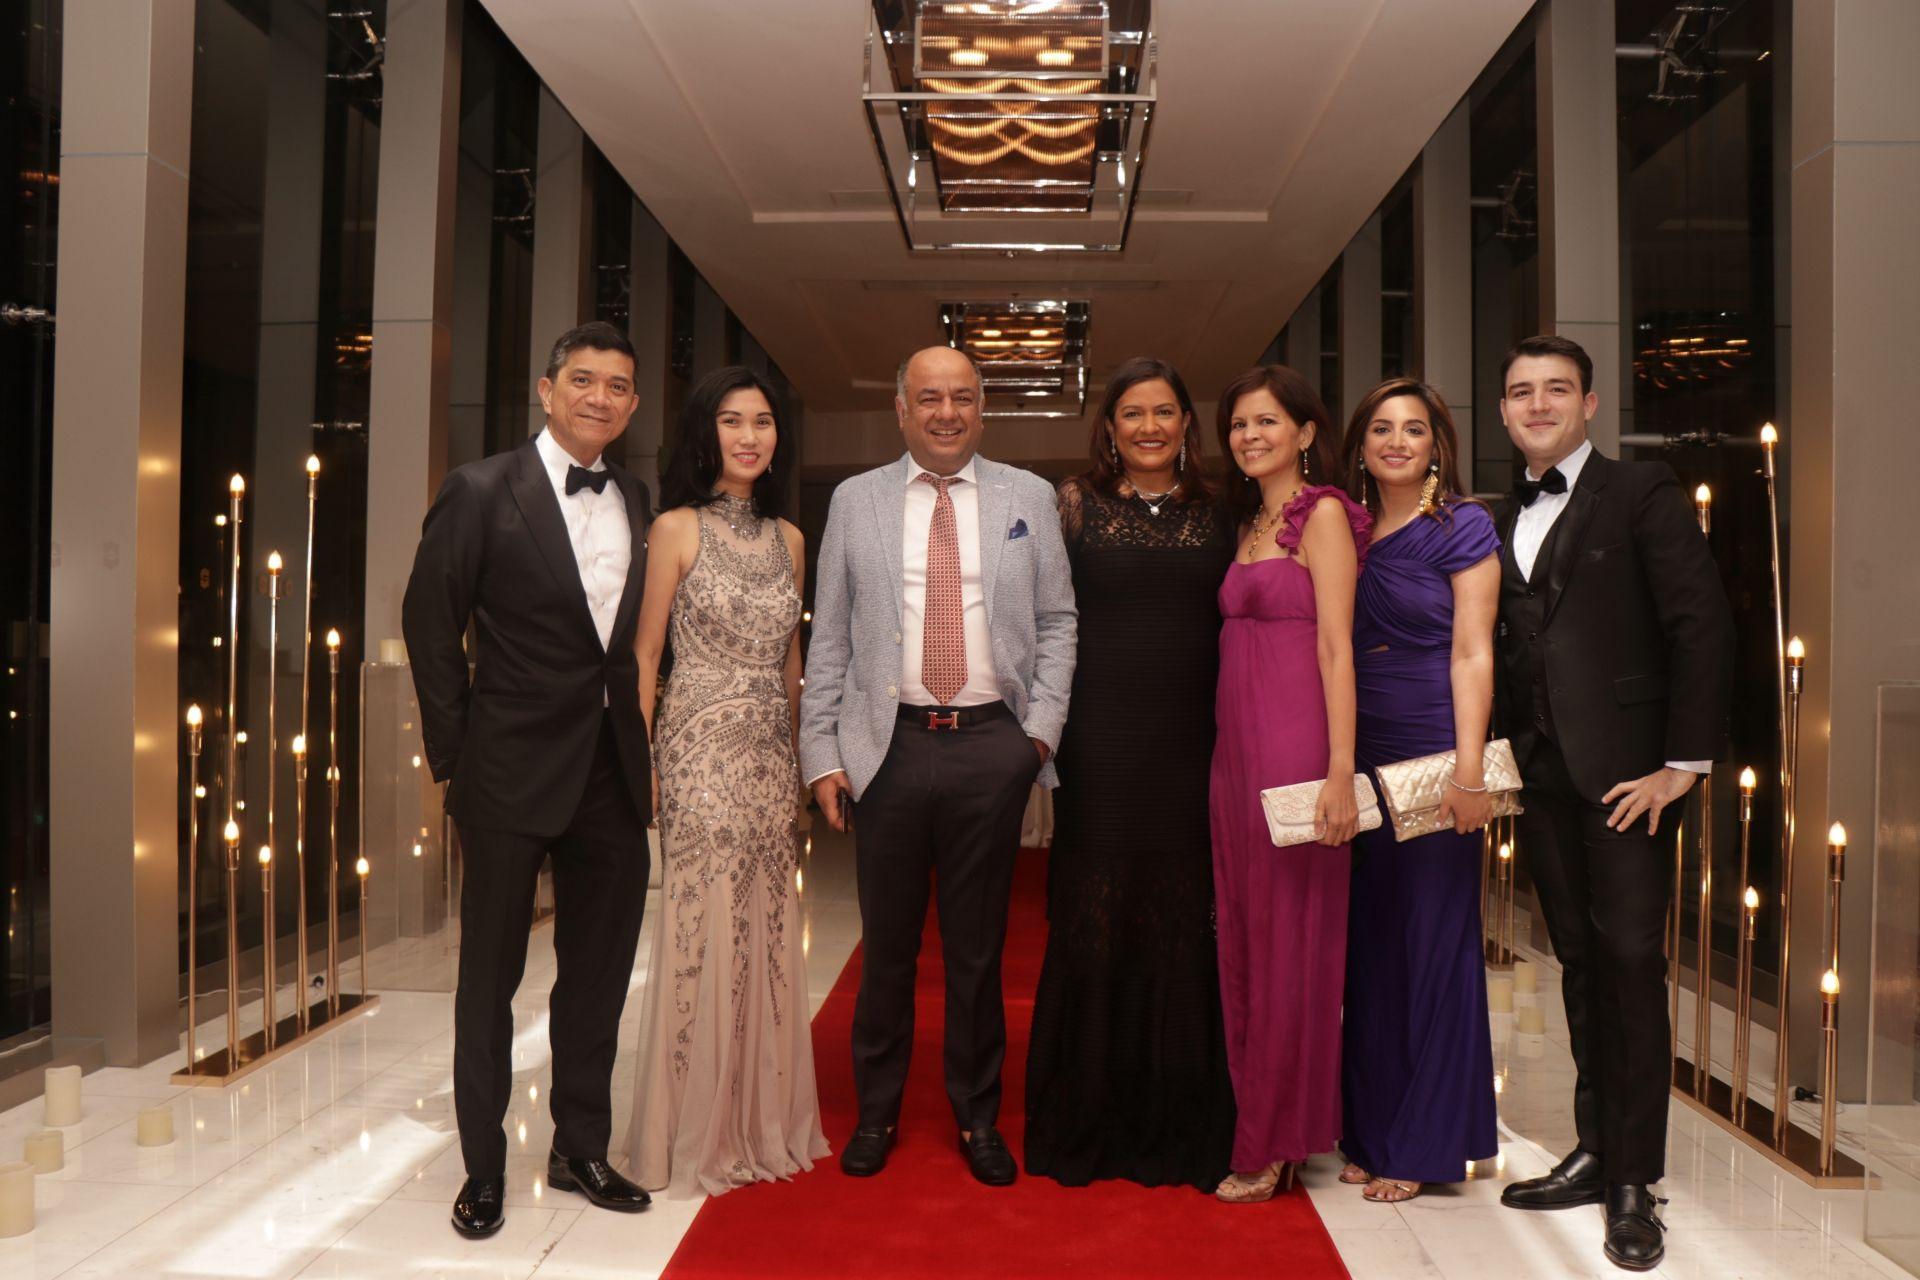 Louie and Liza Bate, Haresh and Sharmela Hiranand, Rose Ann Belmonte, Samantha Hiranand and Carlos Otermin.